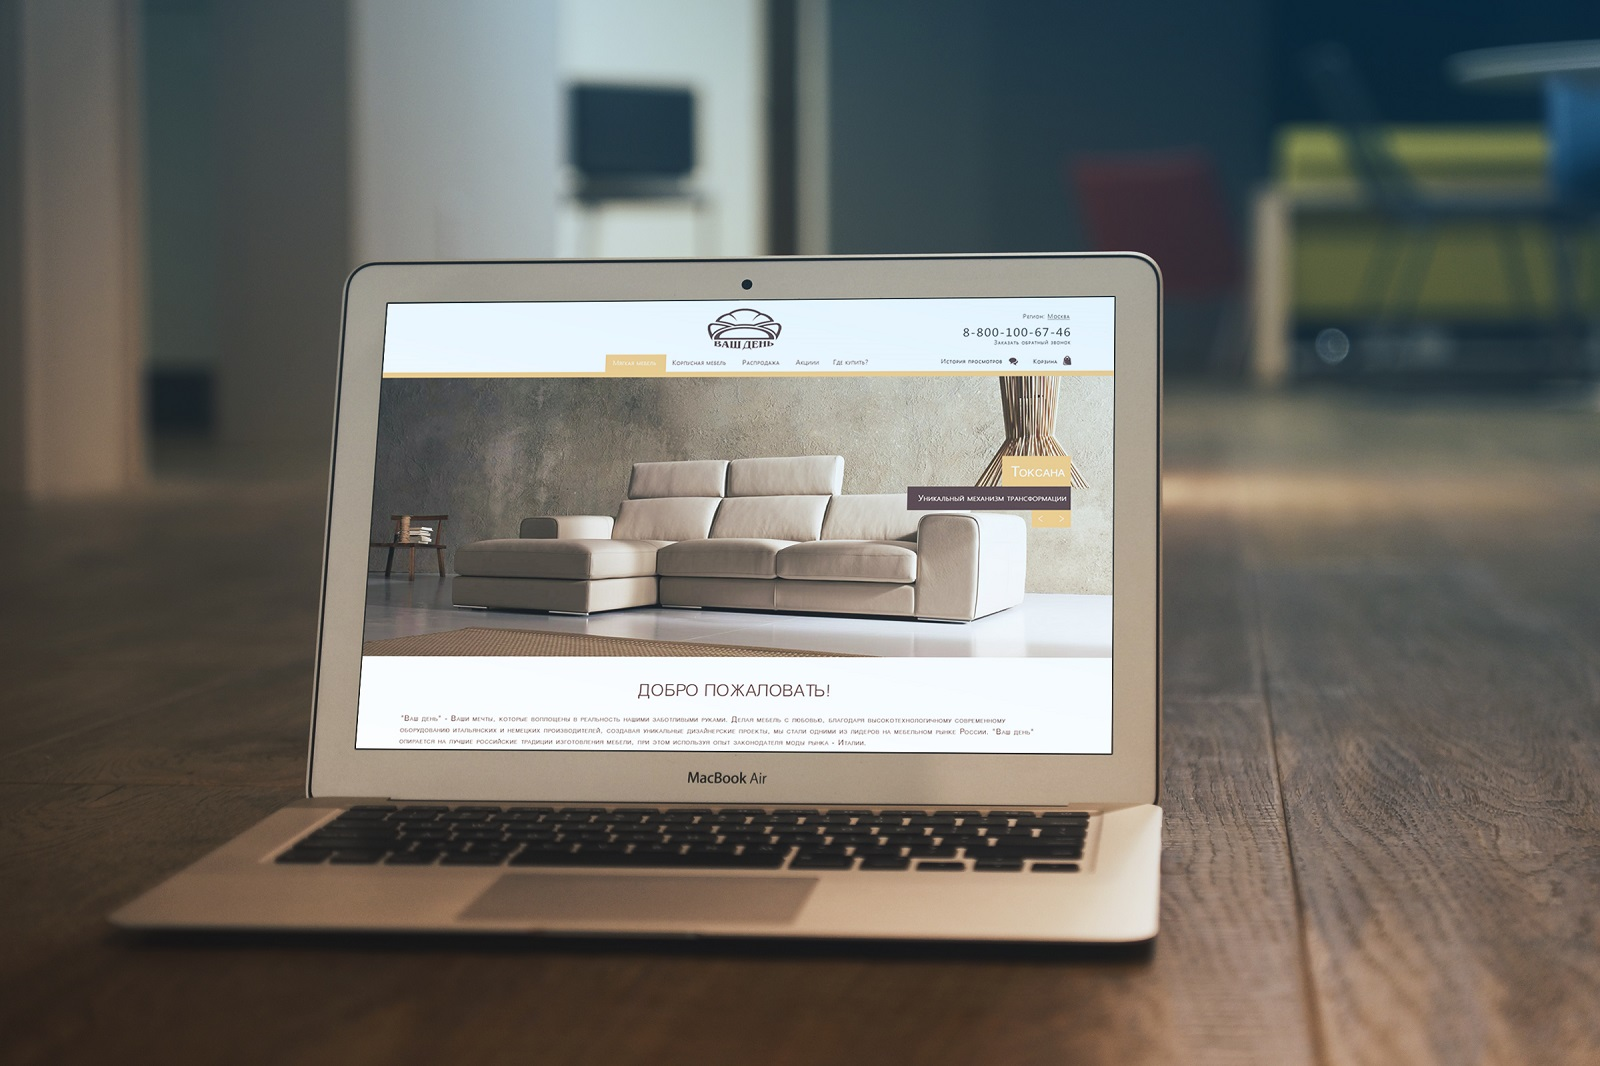 Разработать дизайн для интернет-магазина мебели фото f_54852f1800f48d1b.jpg